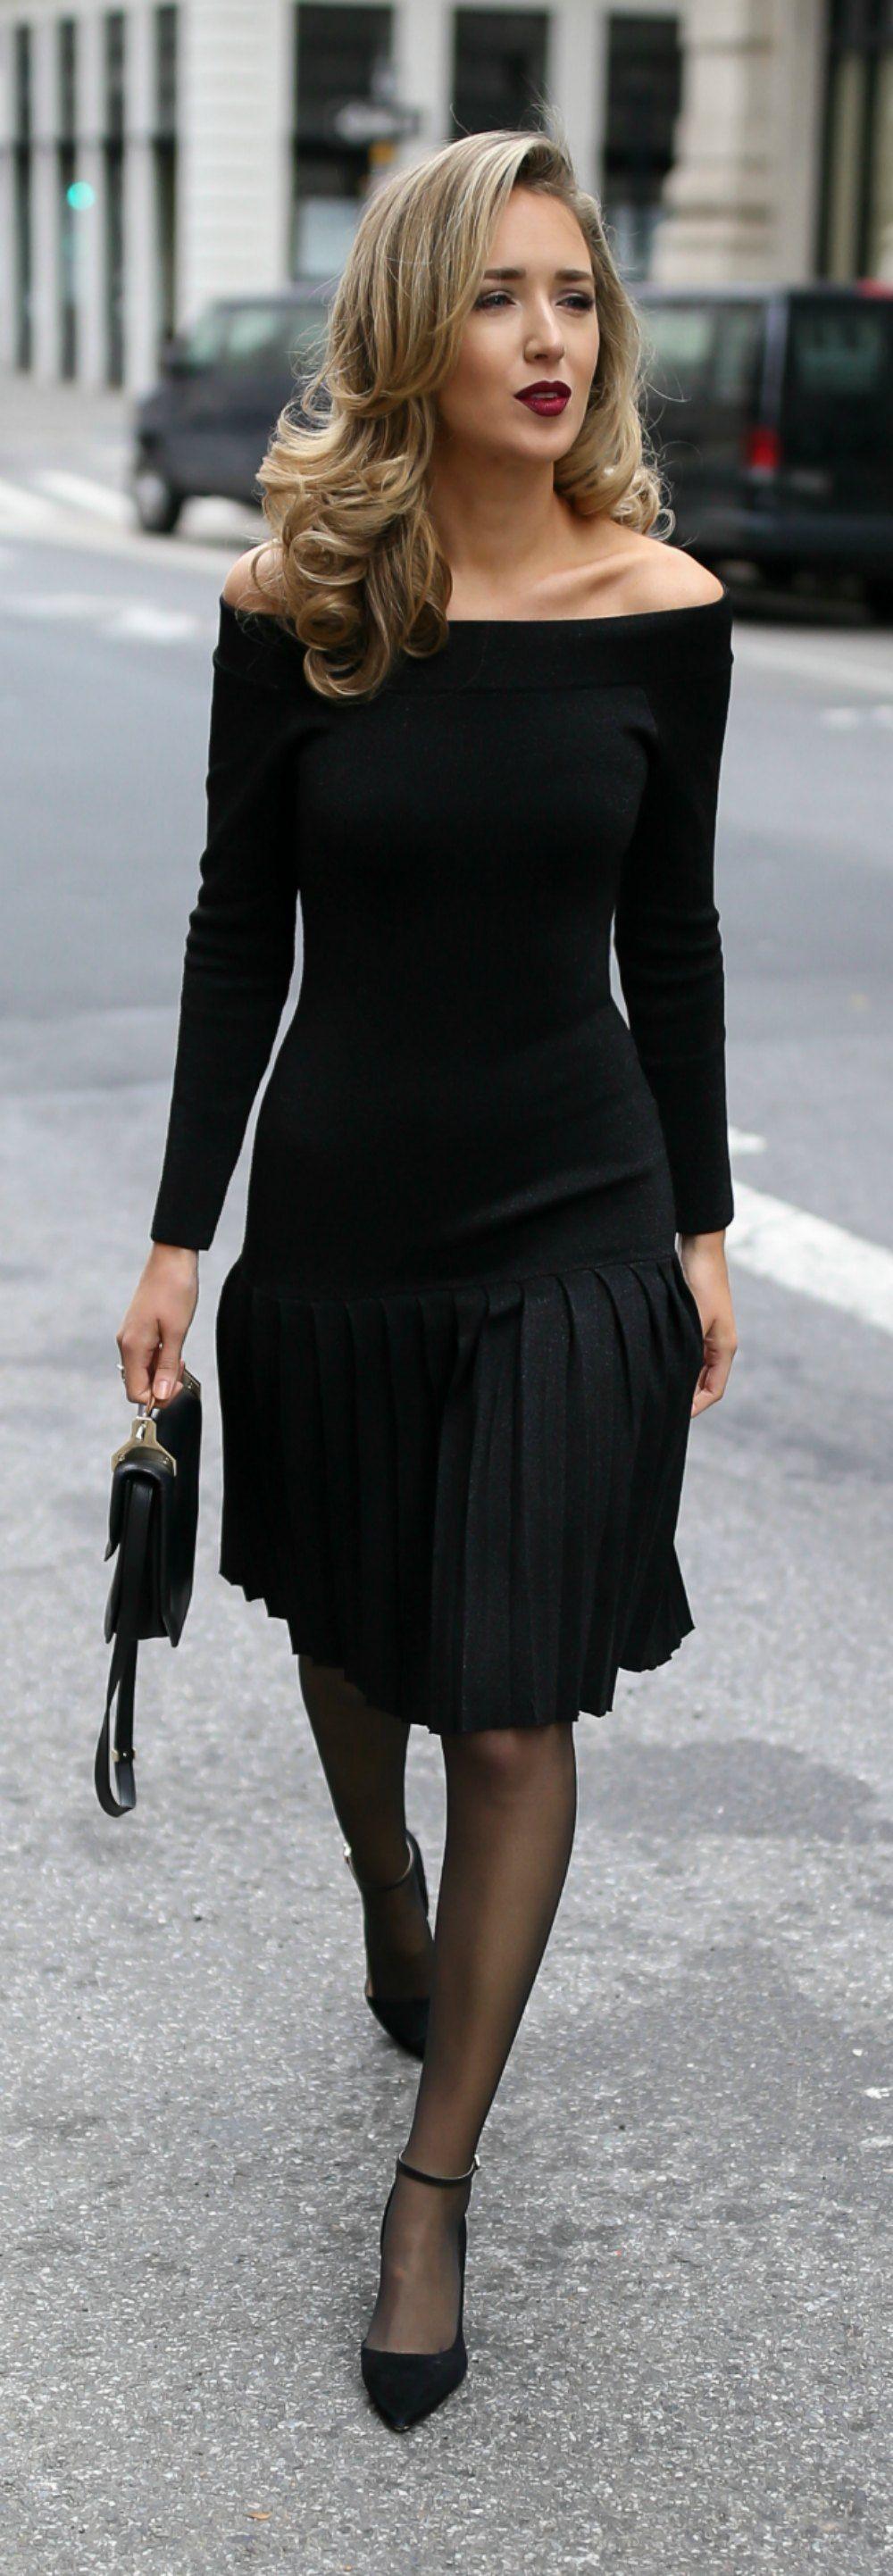 30 Dresses In 30 Days Engagement Party Black Off The Shoulder Pleated Knit Sparkle Dress Black Suede Ankle Str Fashion Black Sparkle Dress Fashion Tights [ 2885 x 1000 Pixel ]